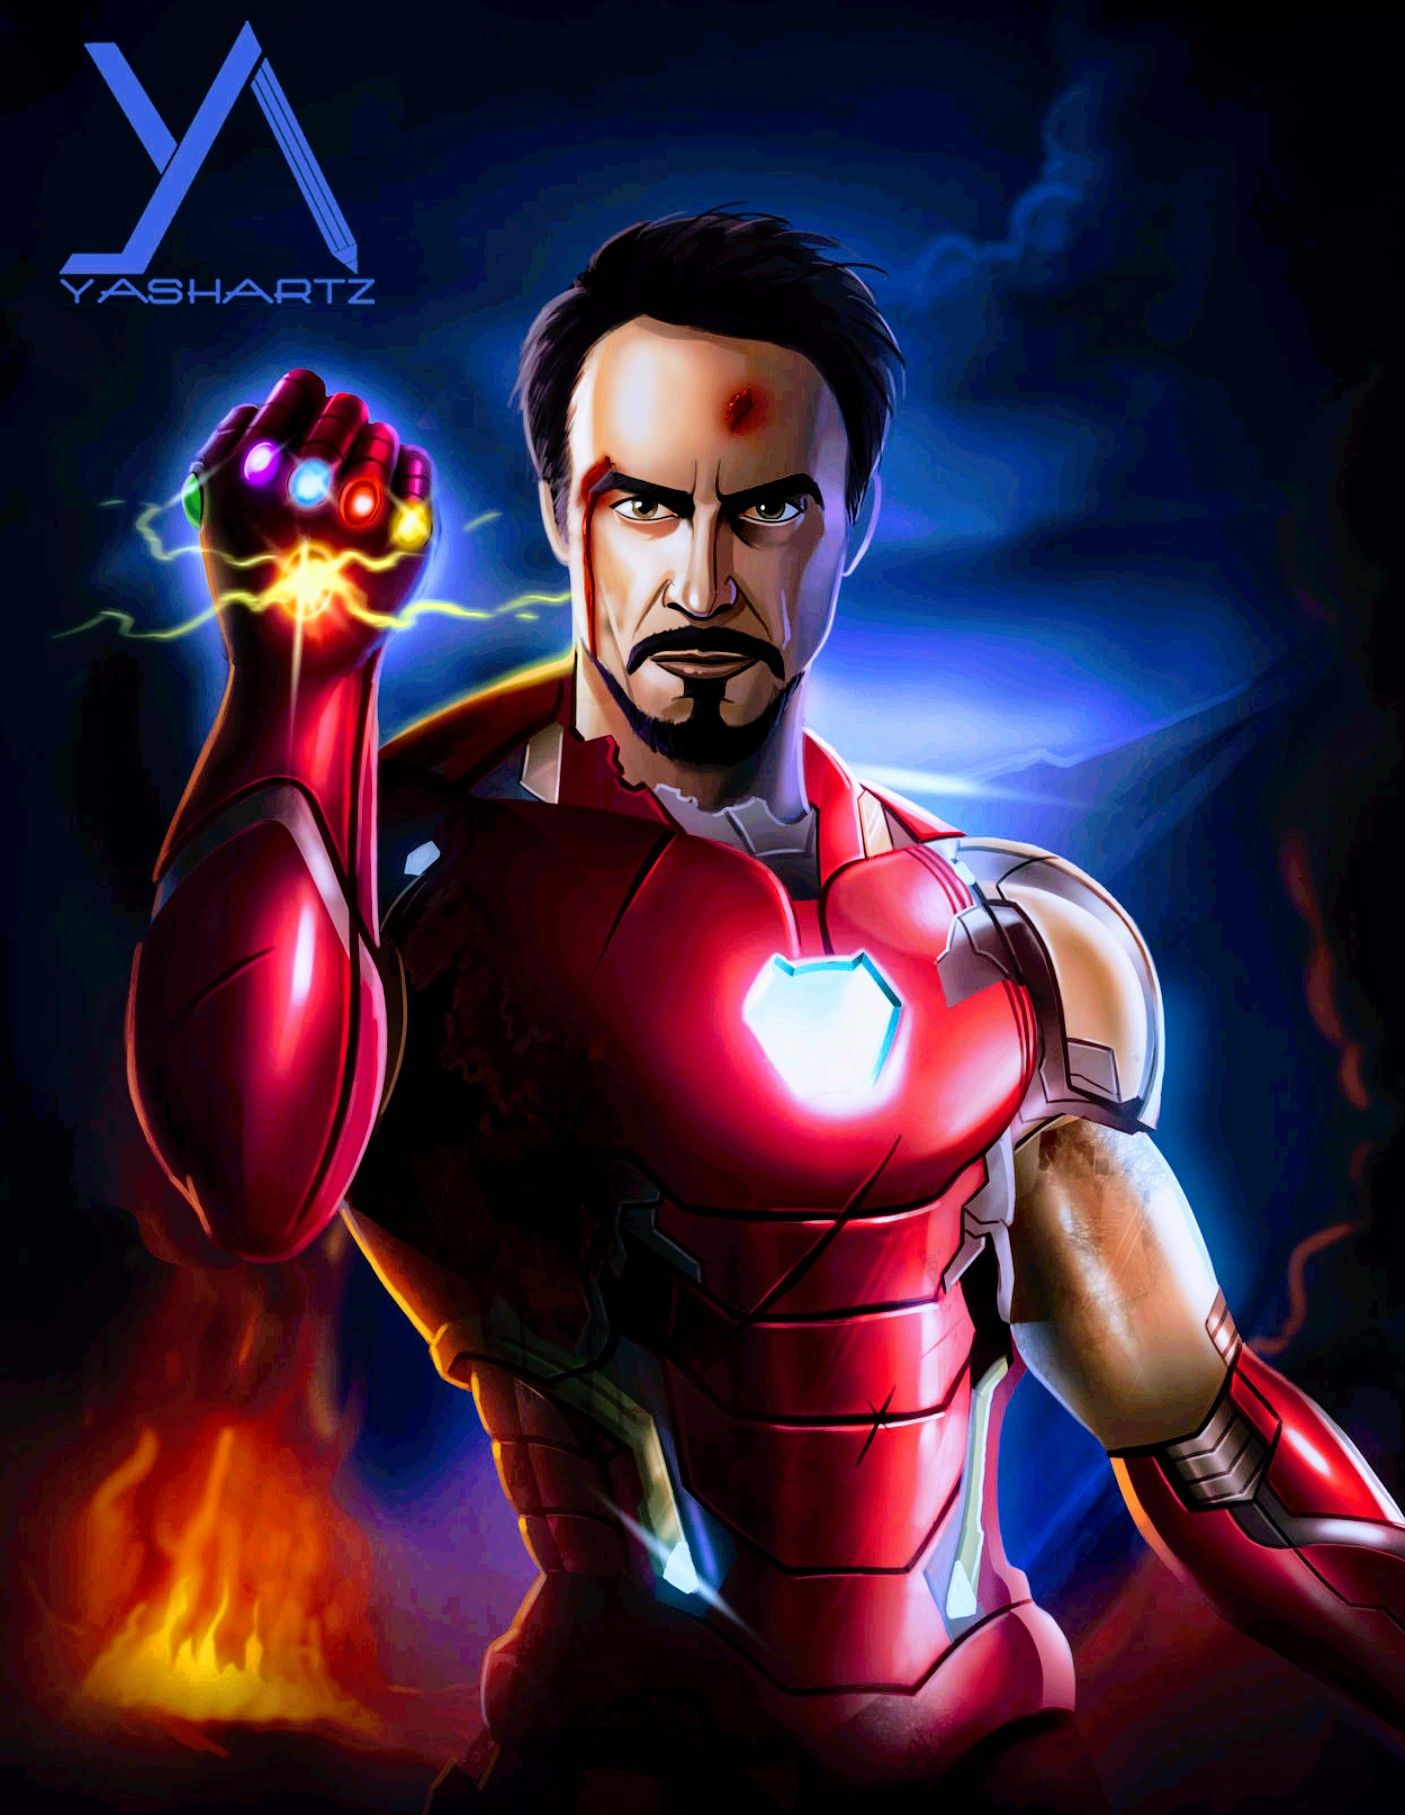 Iron Man - Iron Infinity Gauntlet, Avengers: End Game | Iron man